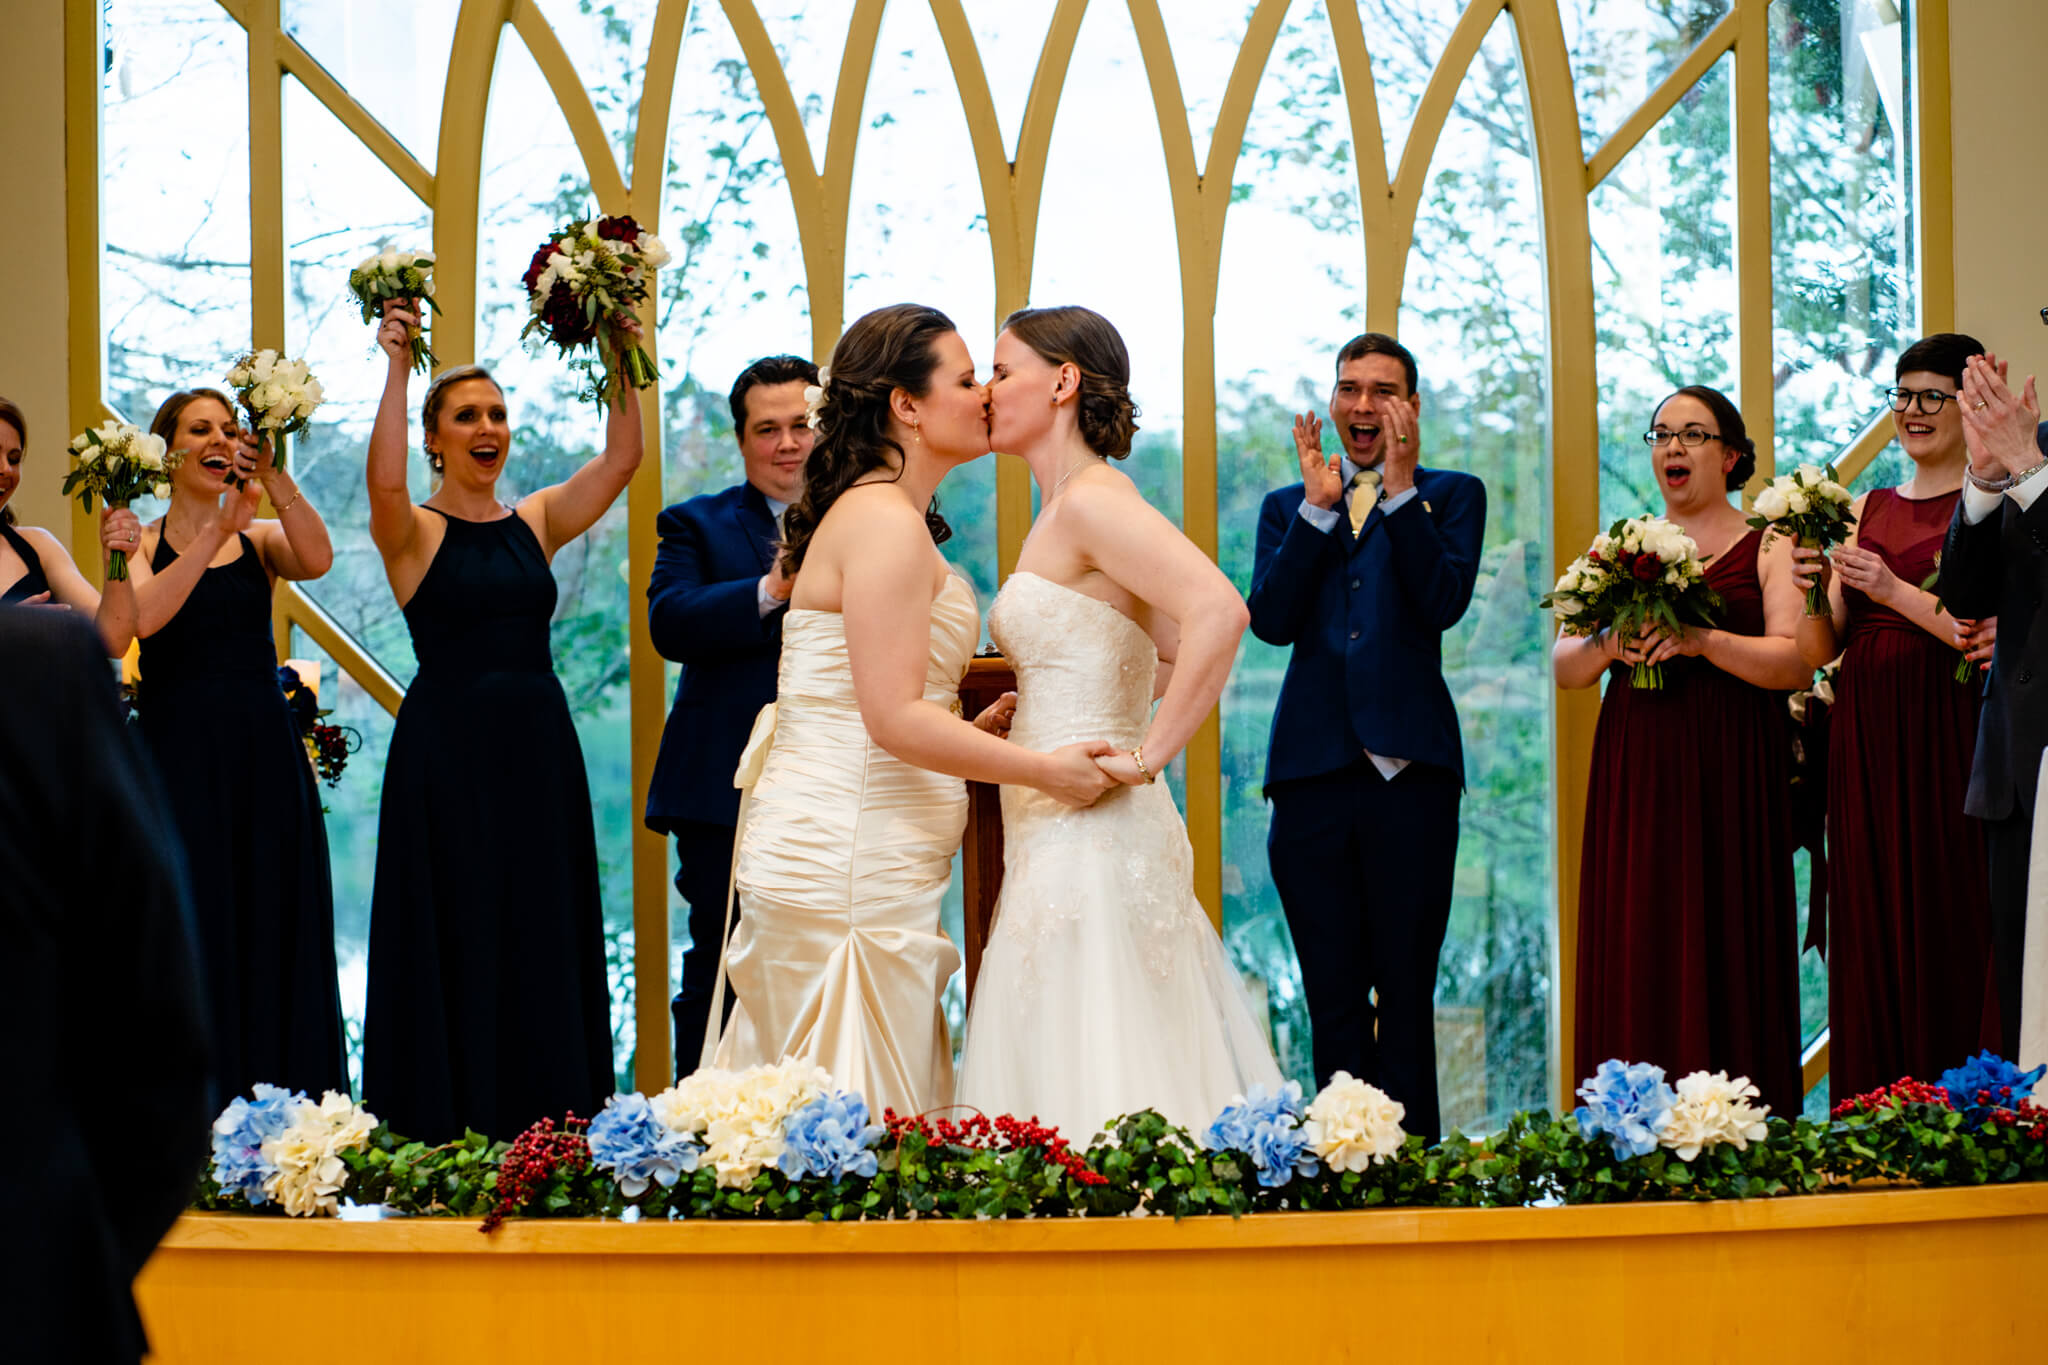 Catherine Laura University of Florida Wedding Smathers Library Reception Baughman Center Ceremony Lake Alice Wedding-24.jpg